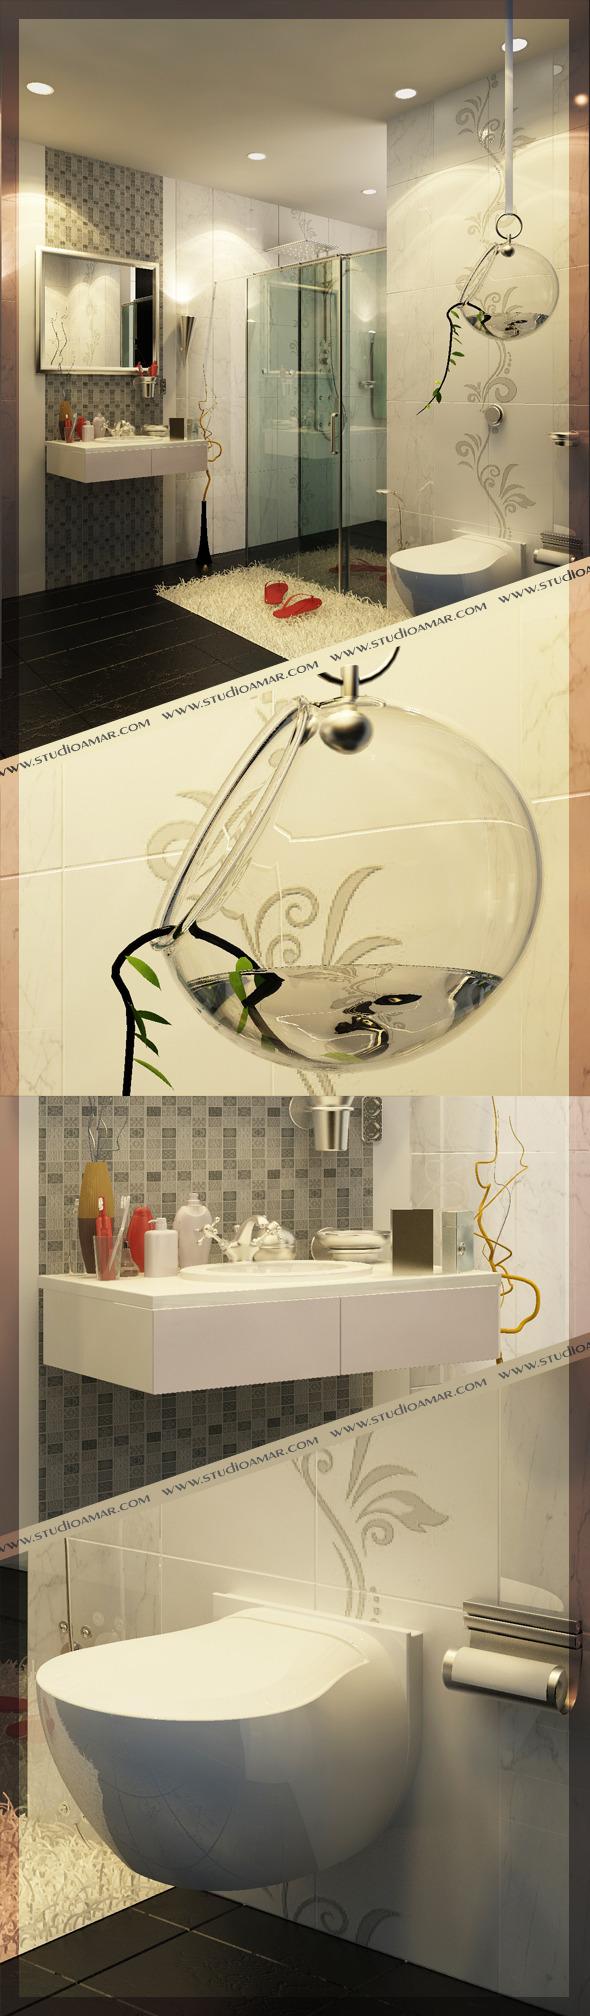 3DOcean Realistic Bathroom 117 5112405